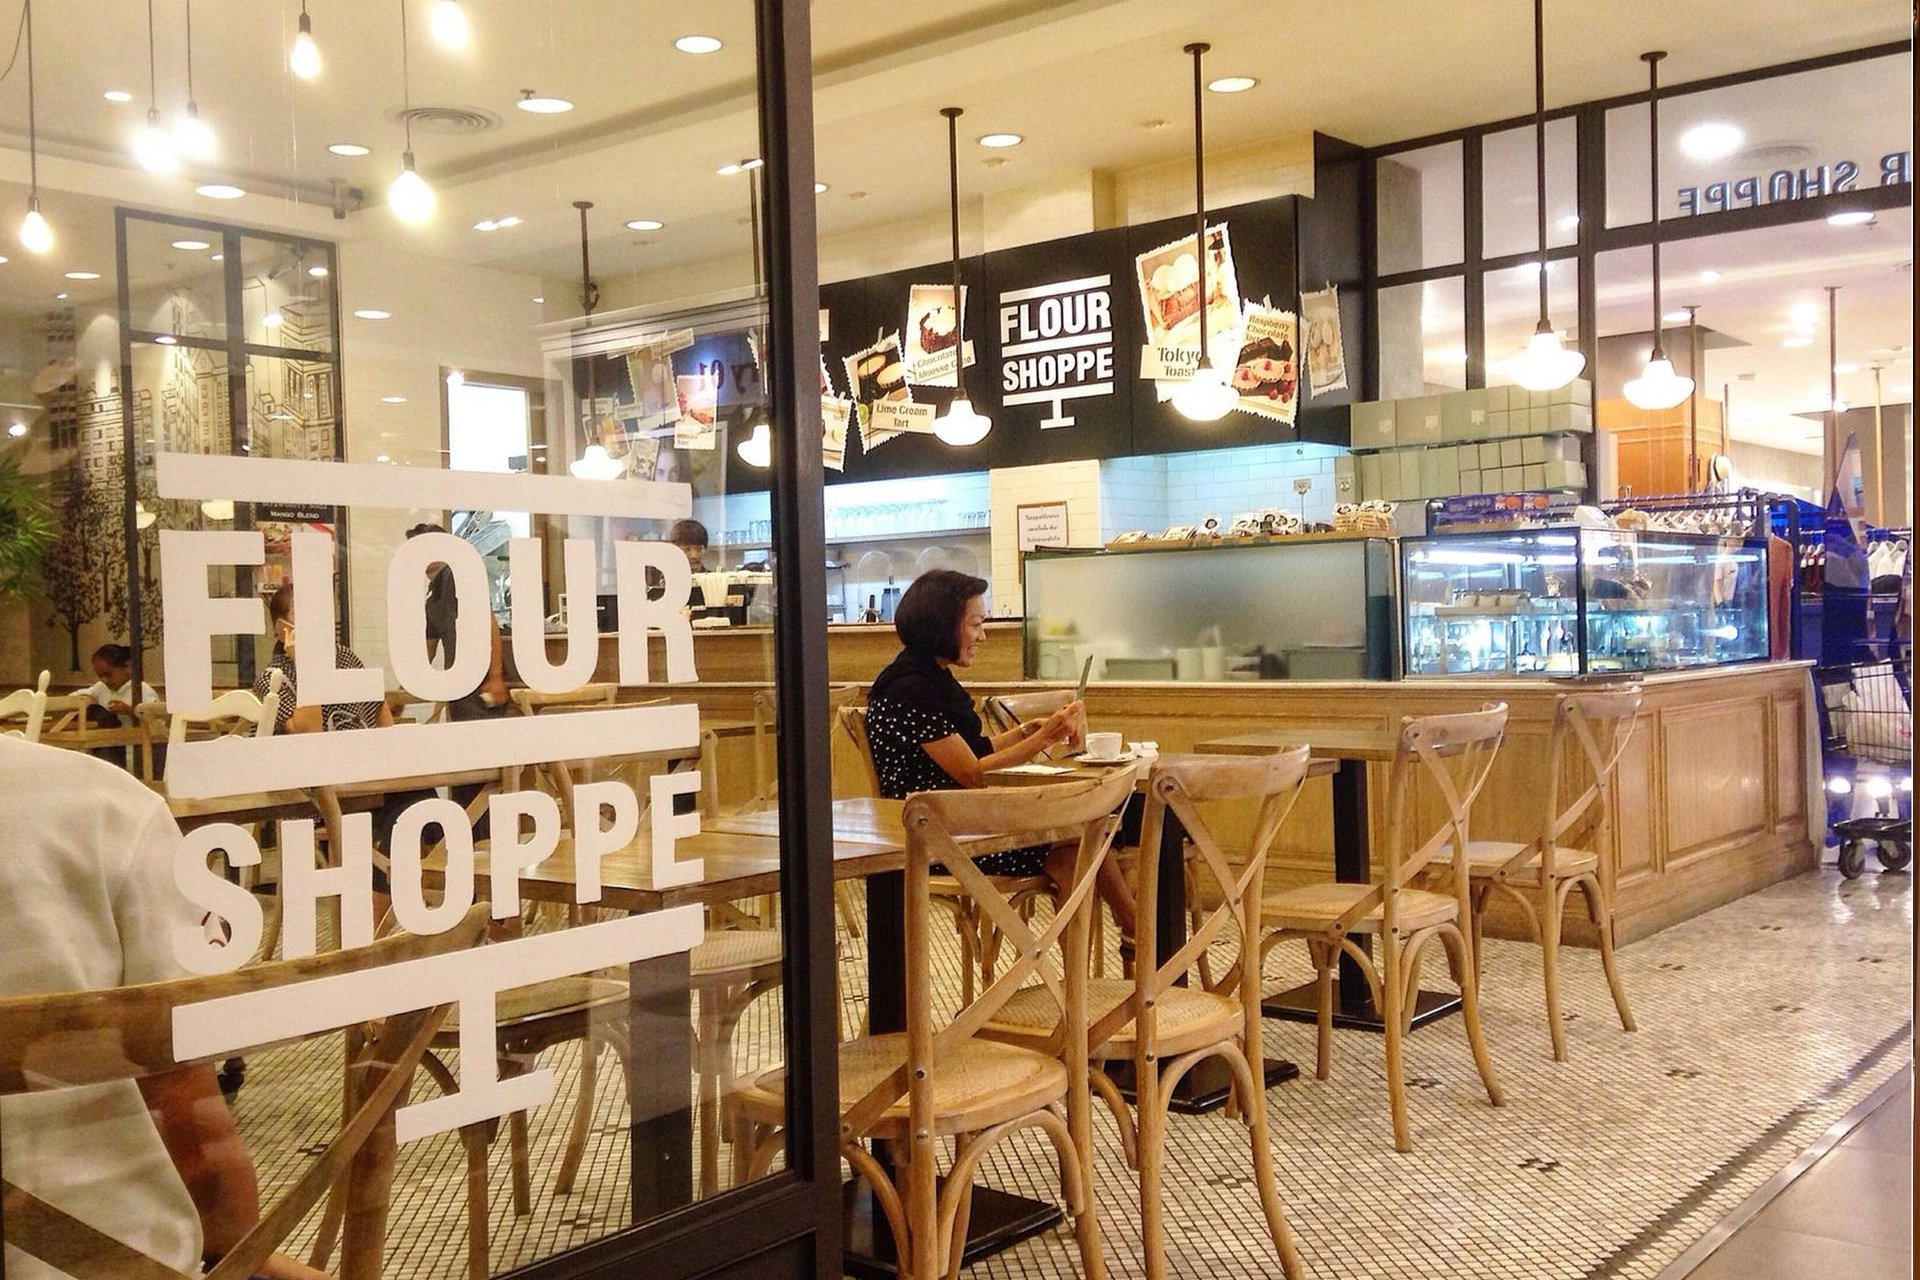 Flour Shoppe